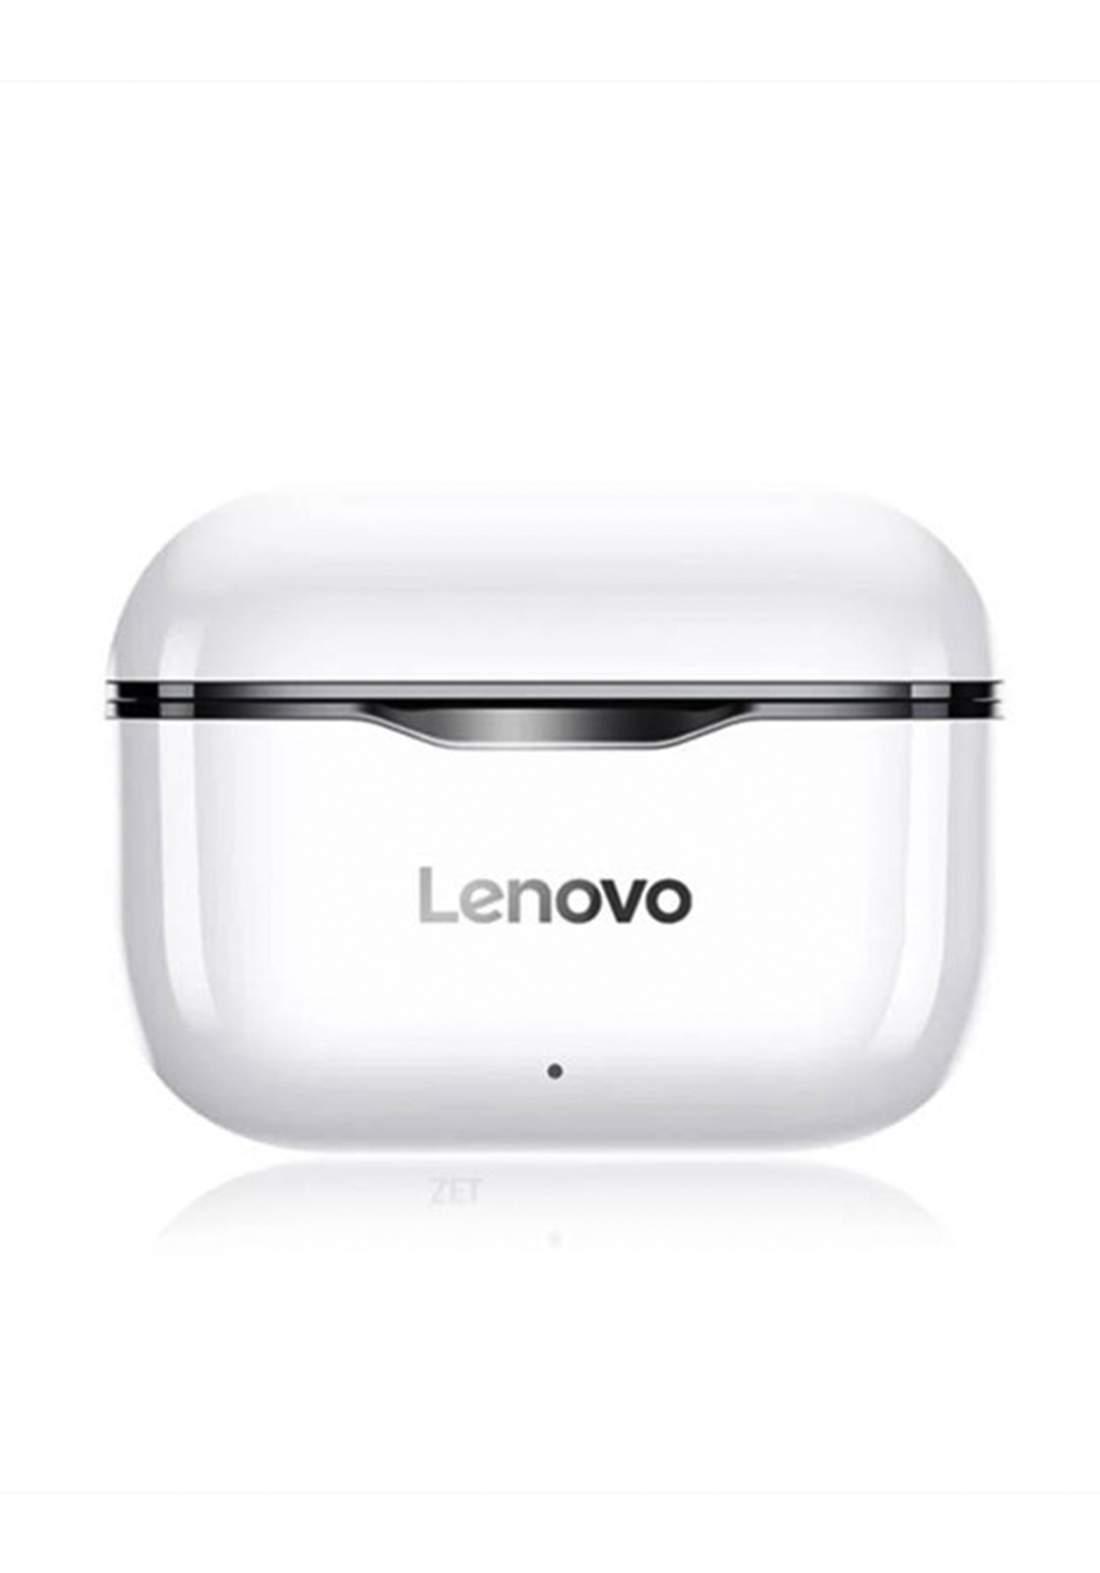 Lenovo Wireless Buds - White سماعة بلوتوث